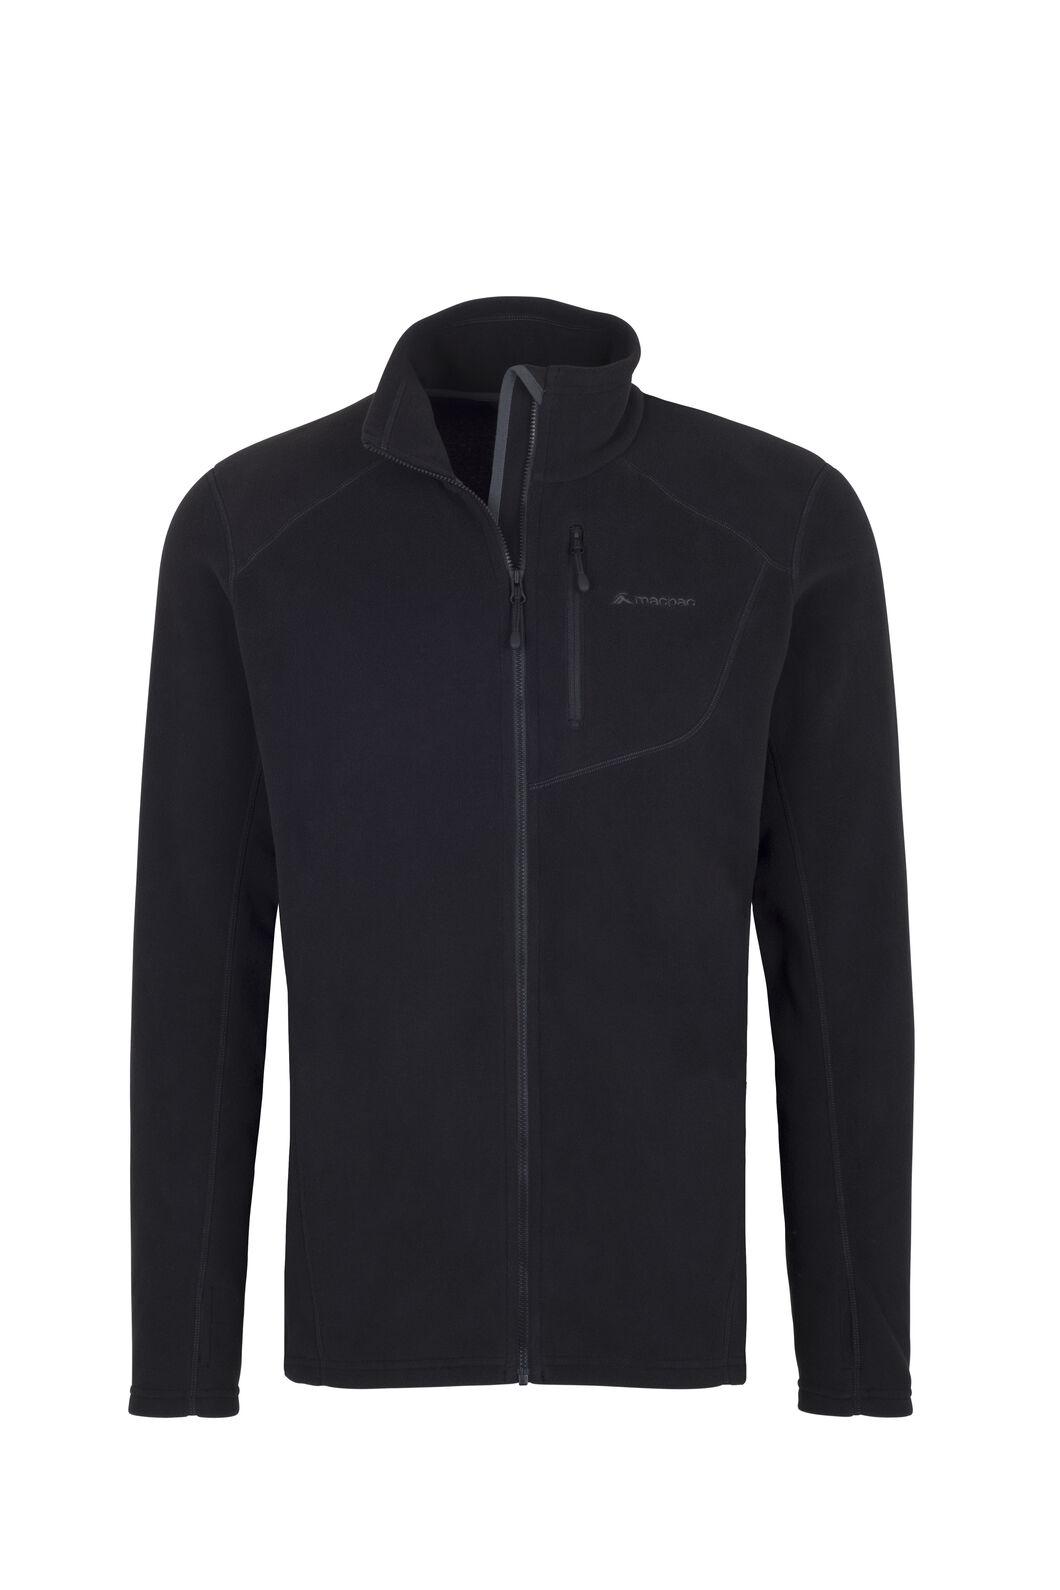 Macpac Kea Polartec® Micro Fleece® Jacket — Men's, Black, hi-res